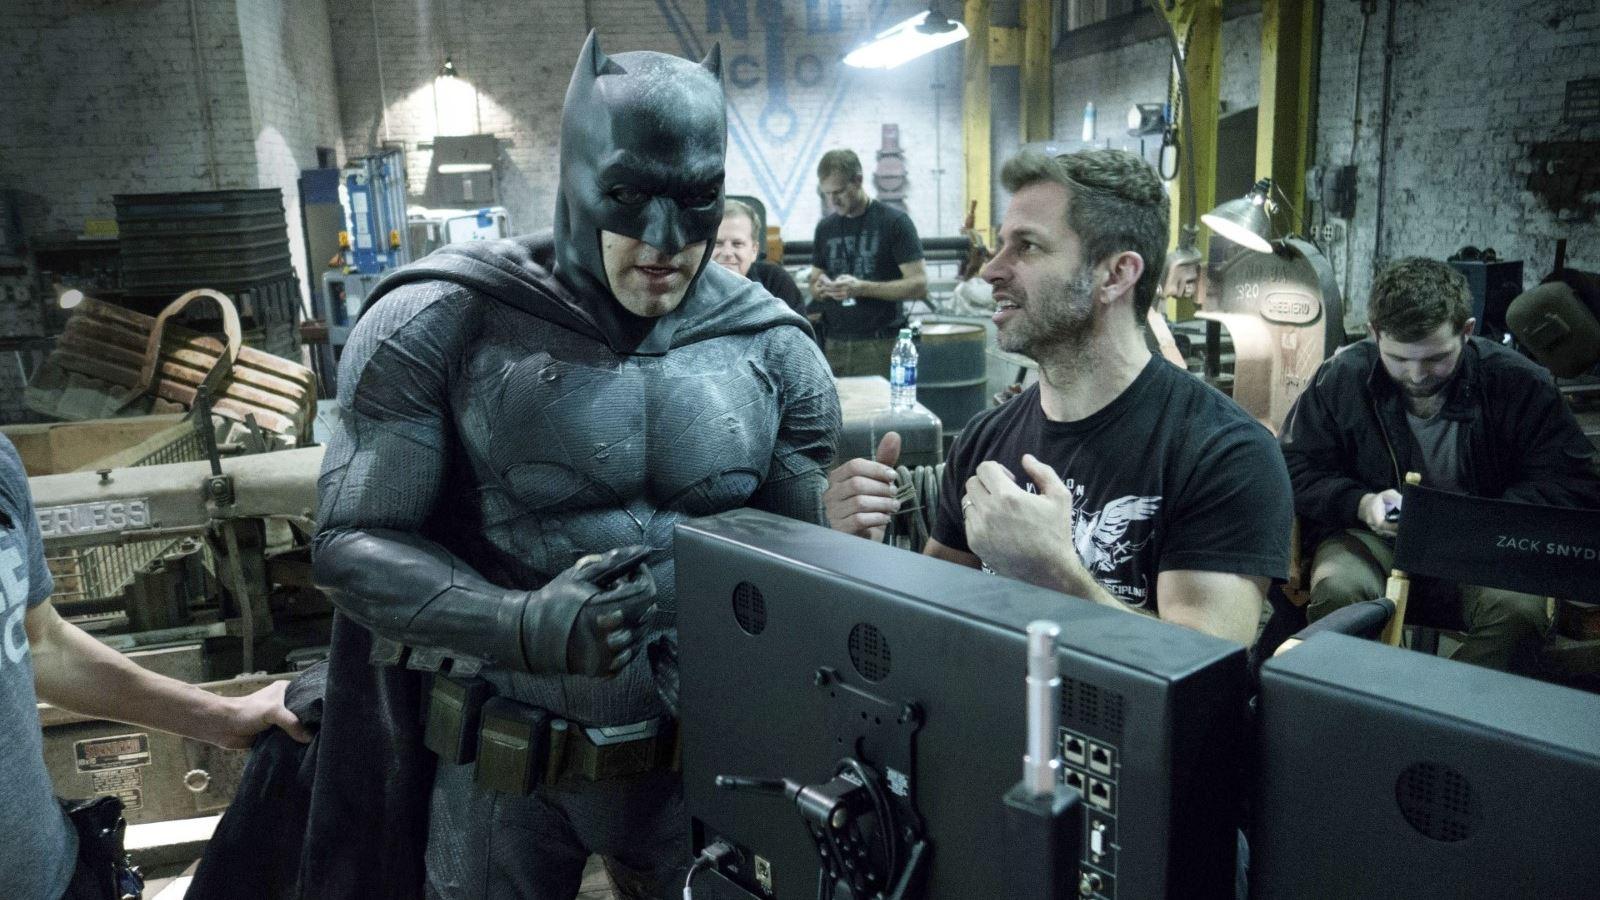 Dc Films On Twitter Zack Snyder S Innovation In Visual